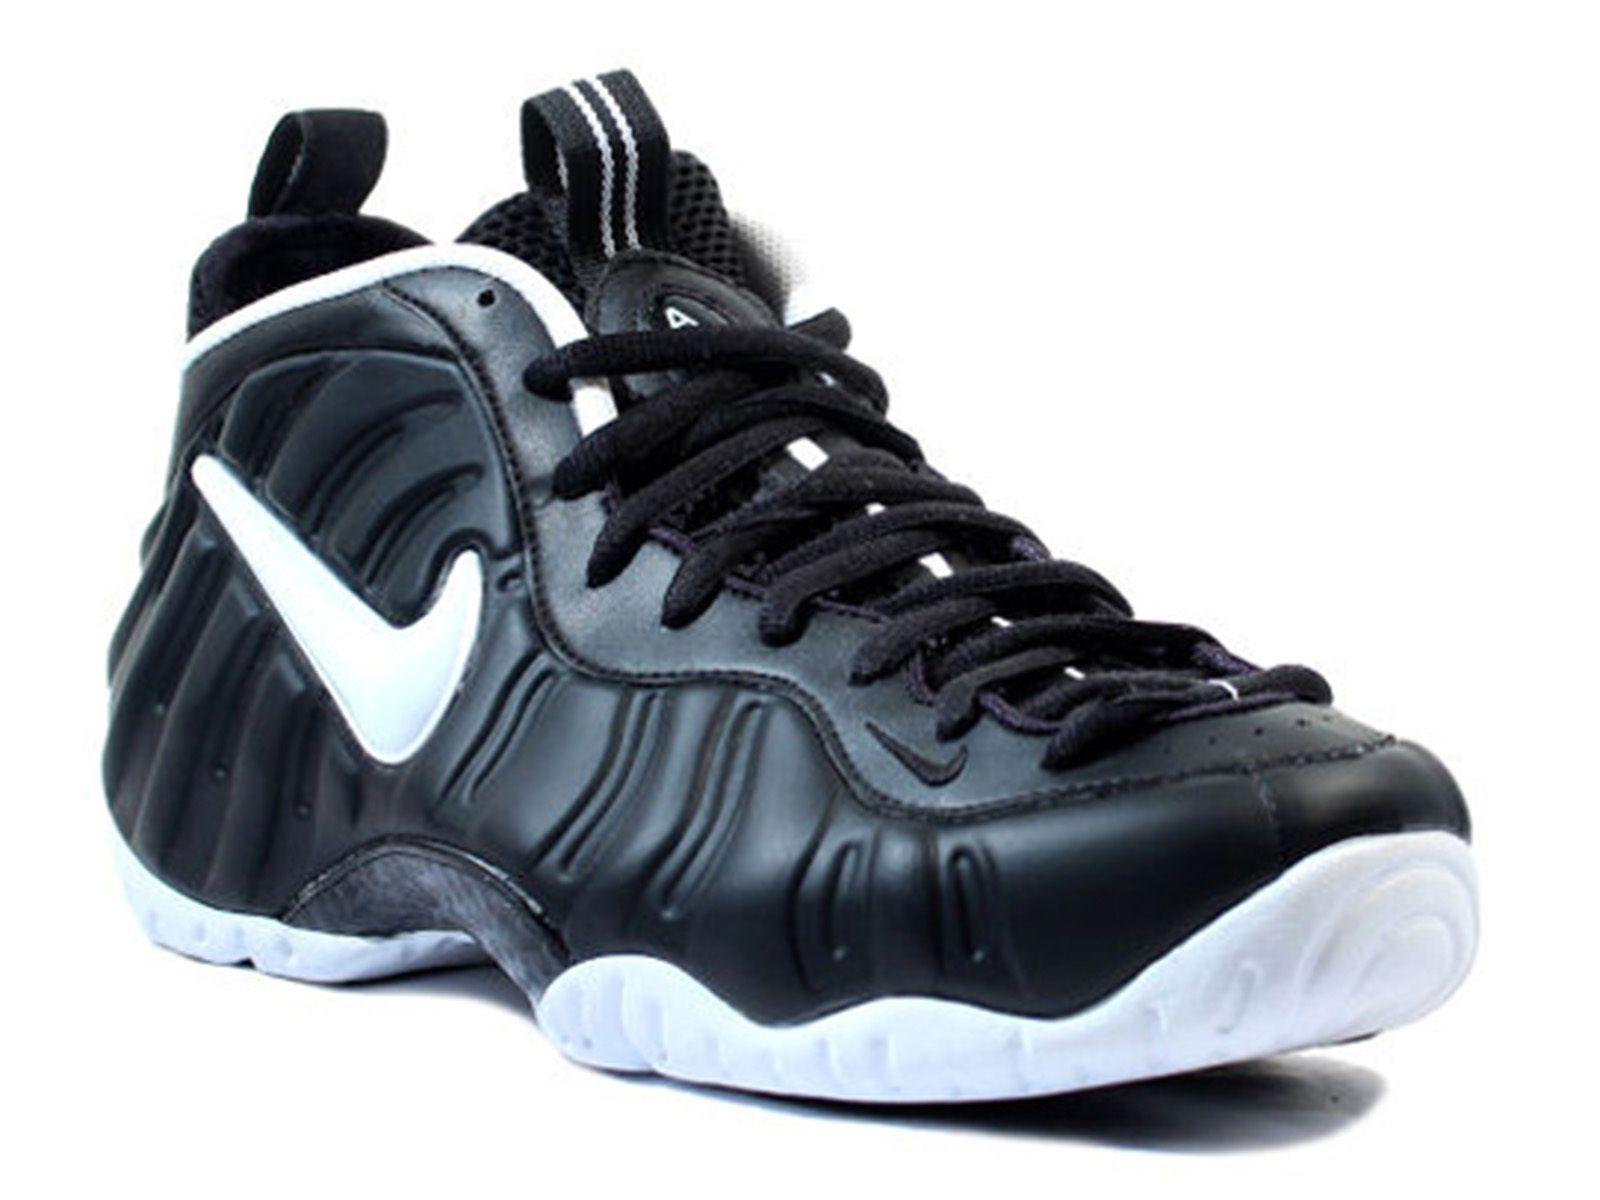 buy online 4b58b 1ad77 Nike Men s Air Foamposite Pro Dr.Doom Shoes (624041-006) Black White-Black  Sz 10